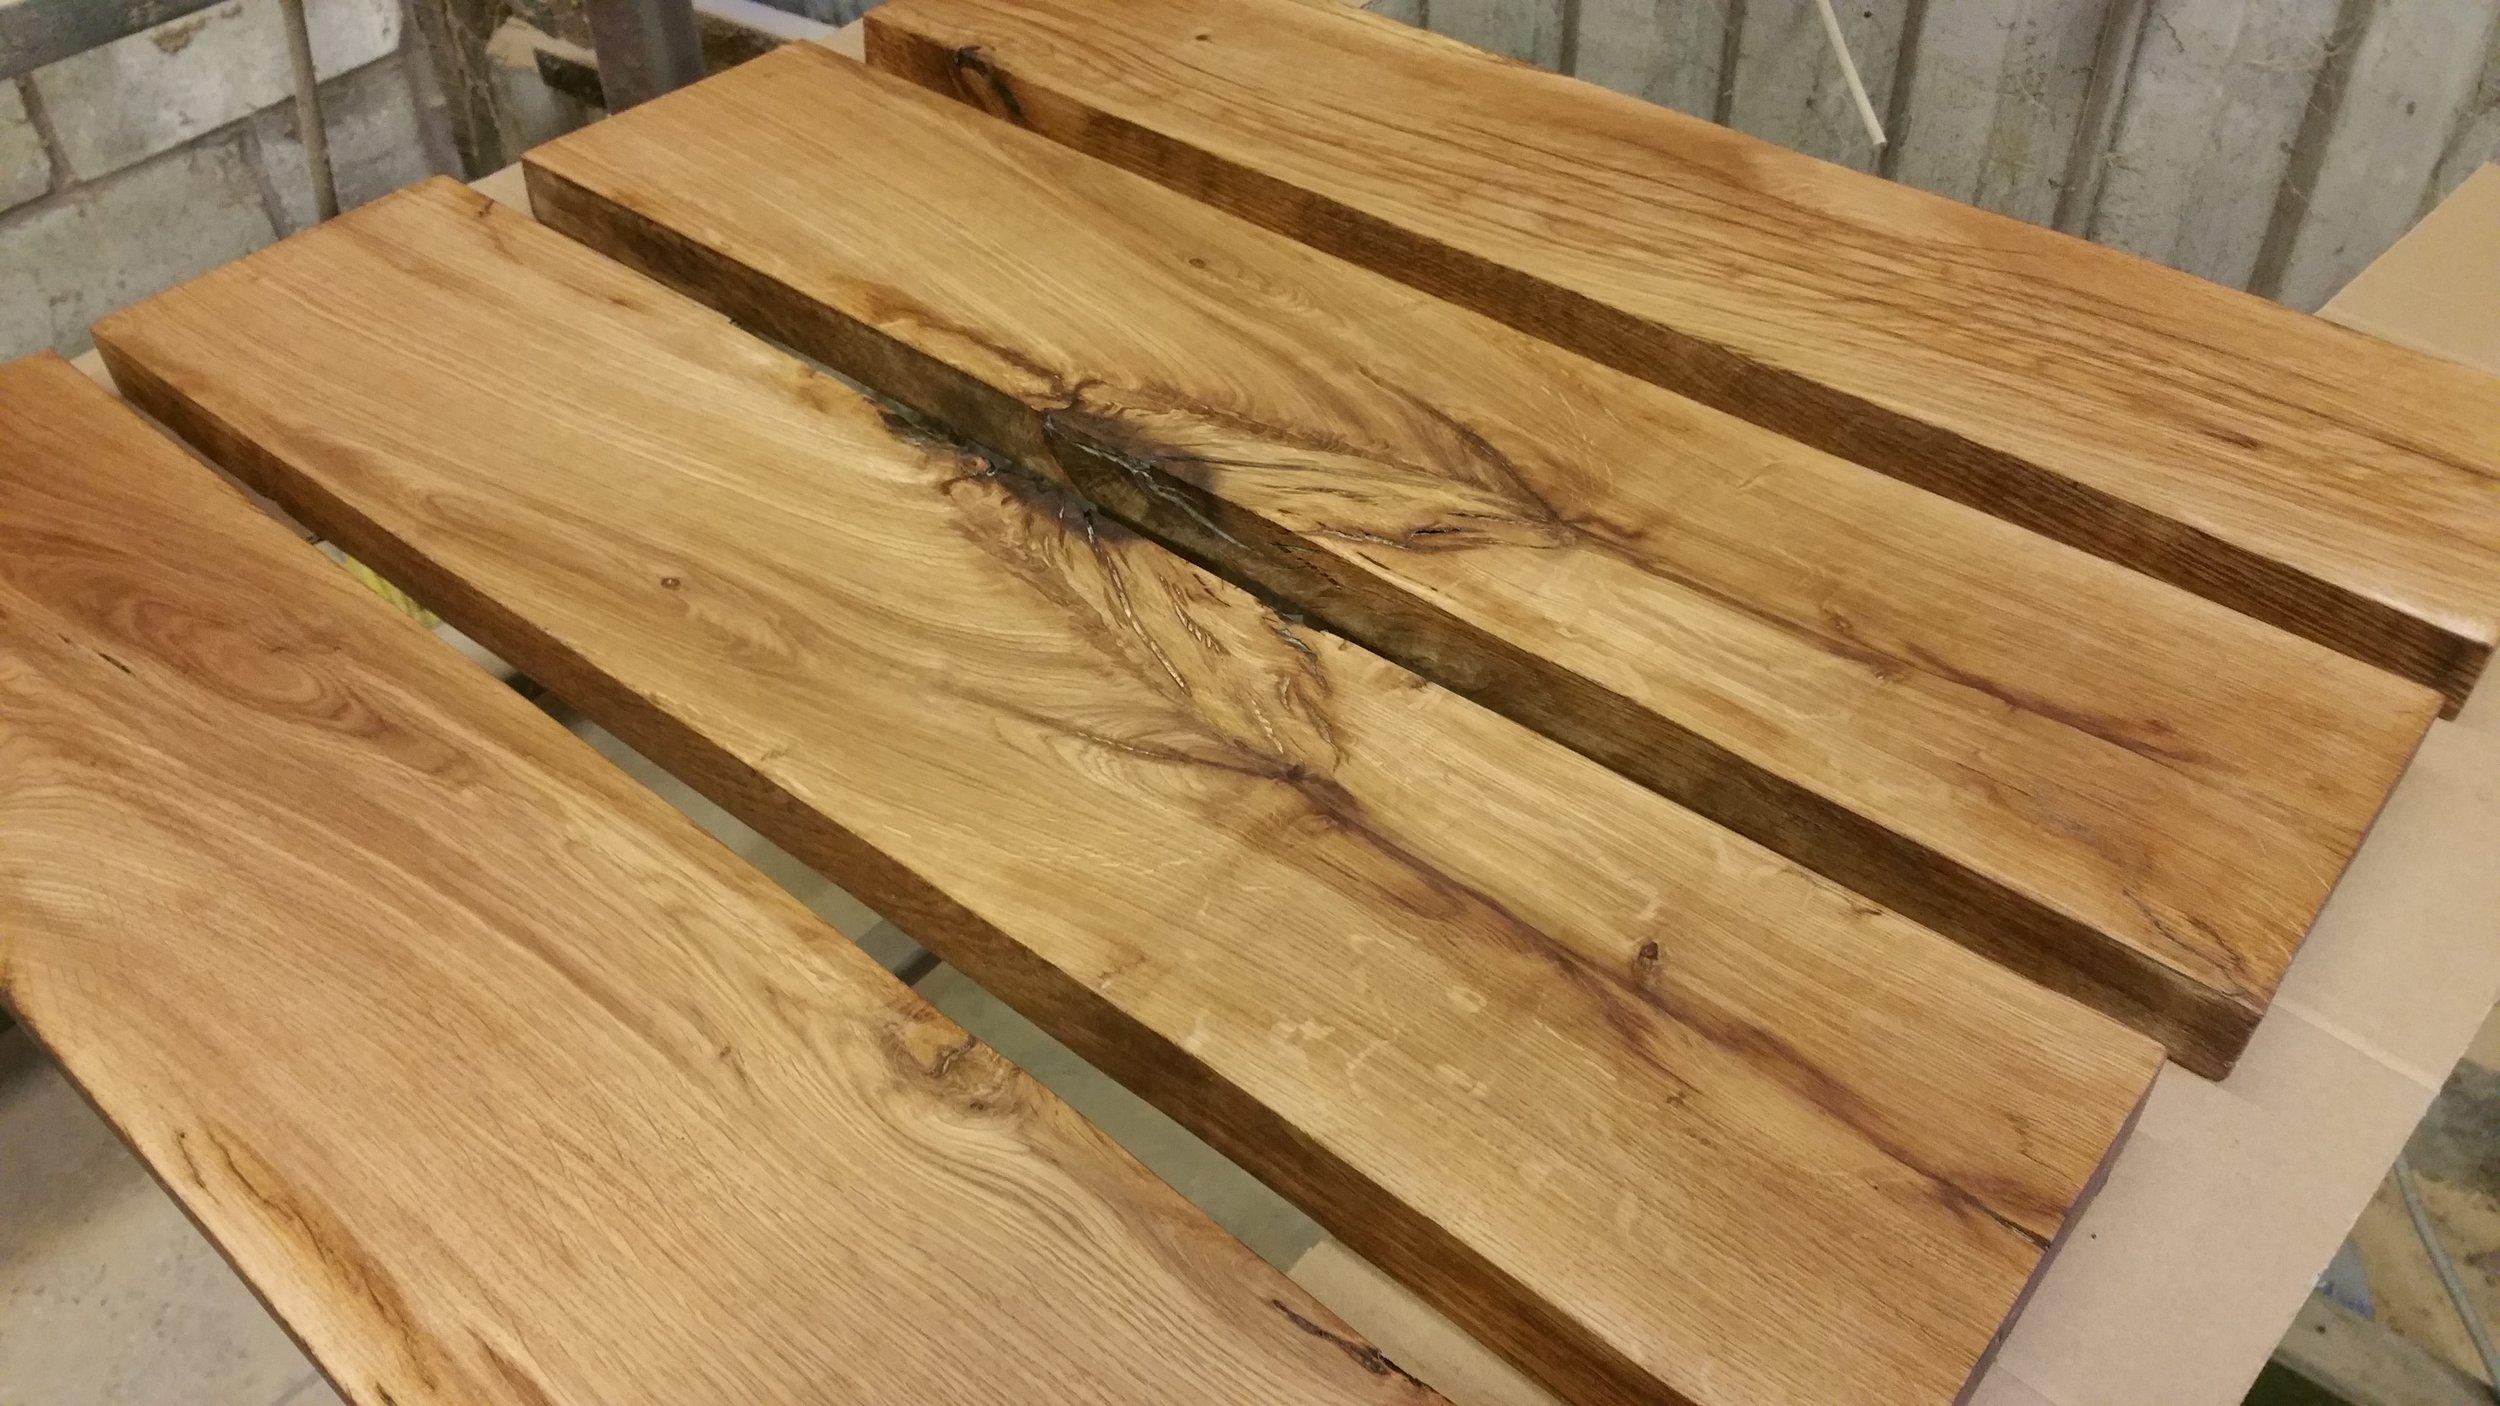 Oak Shelves and Joinery